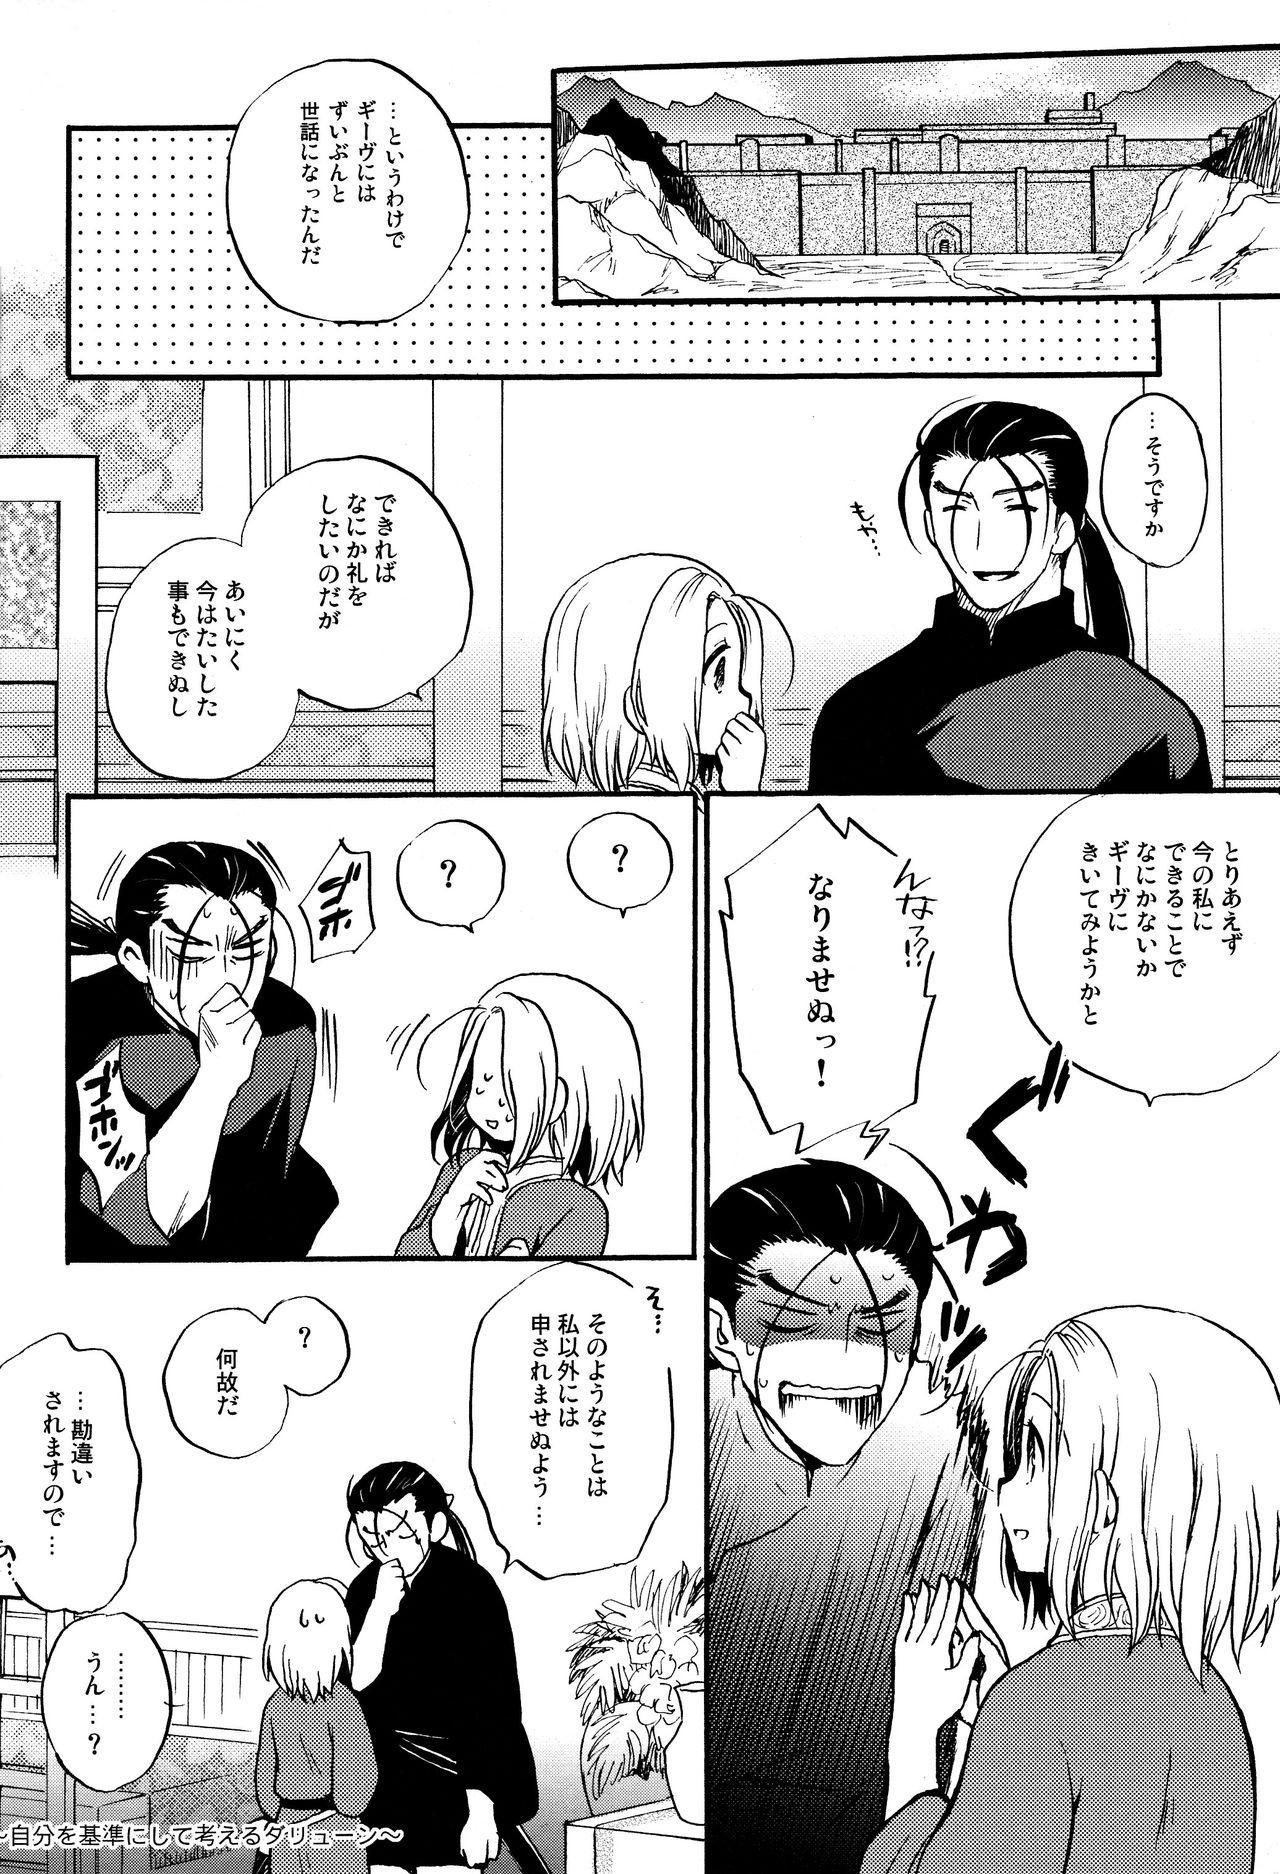 Denka no Gohoubi! 18